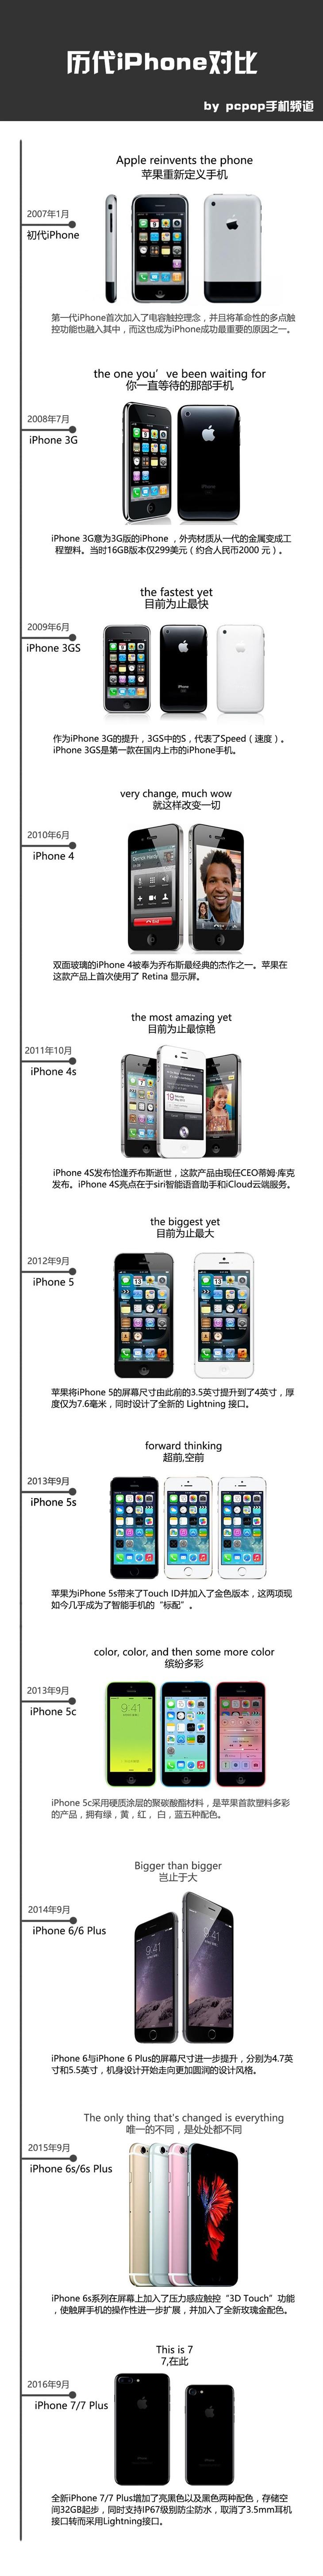 升级巨大 历代iPhoned对比